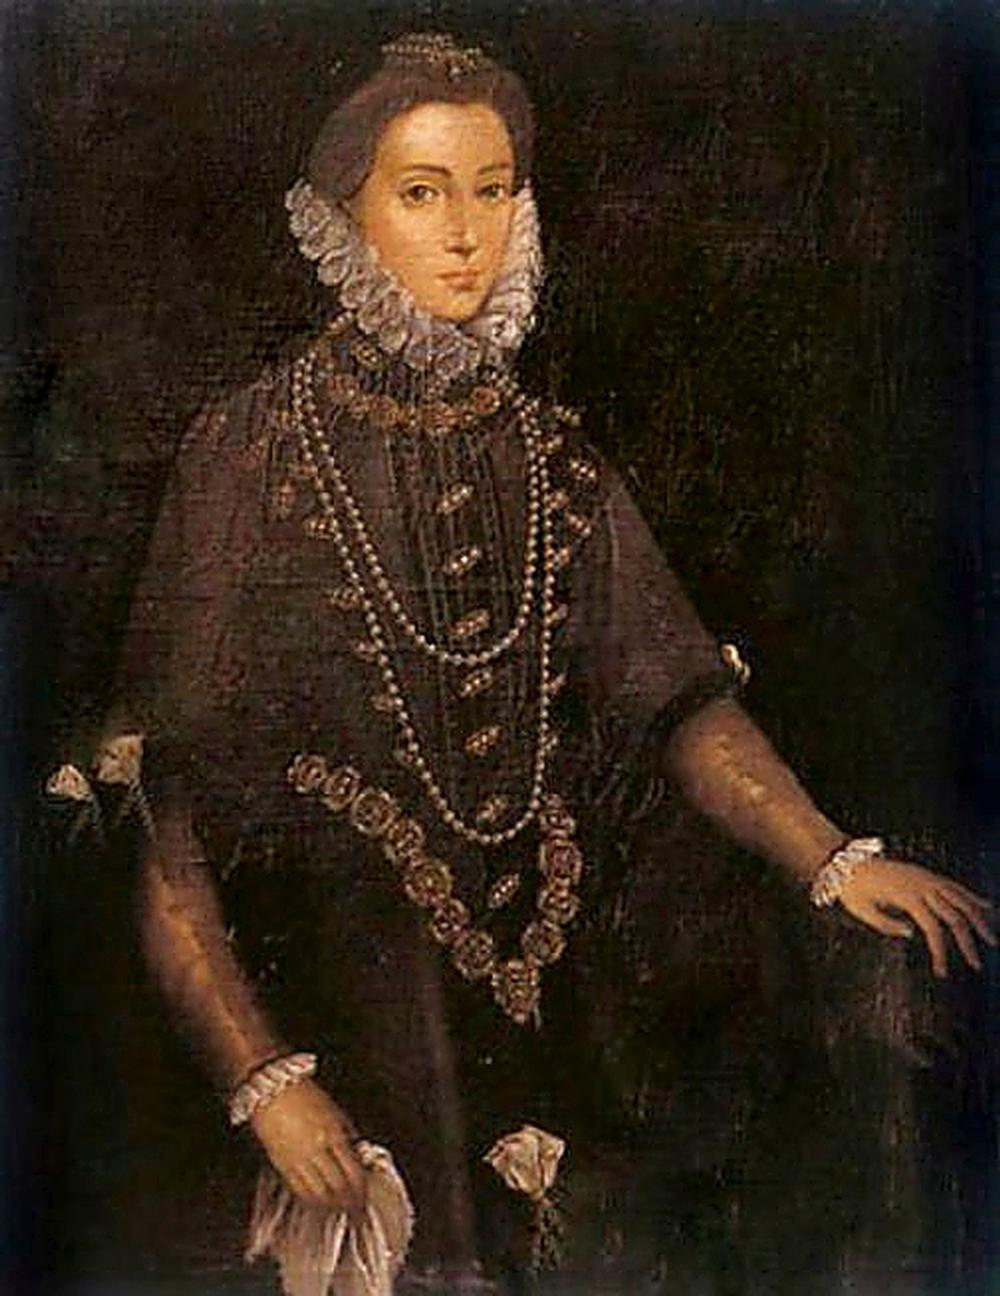 Retrato de la aristócrata.